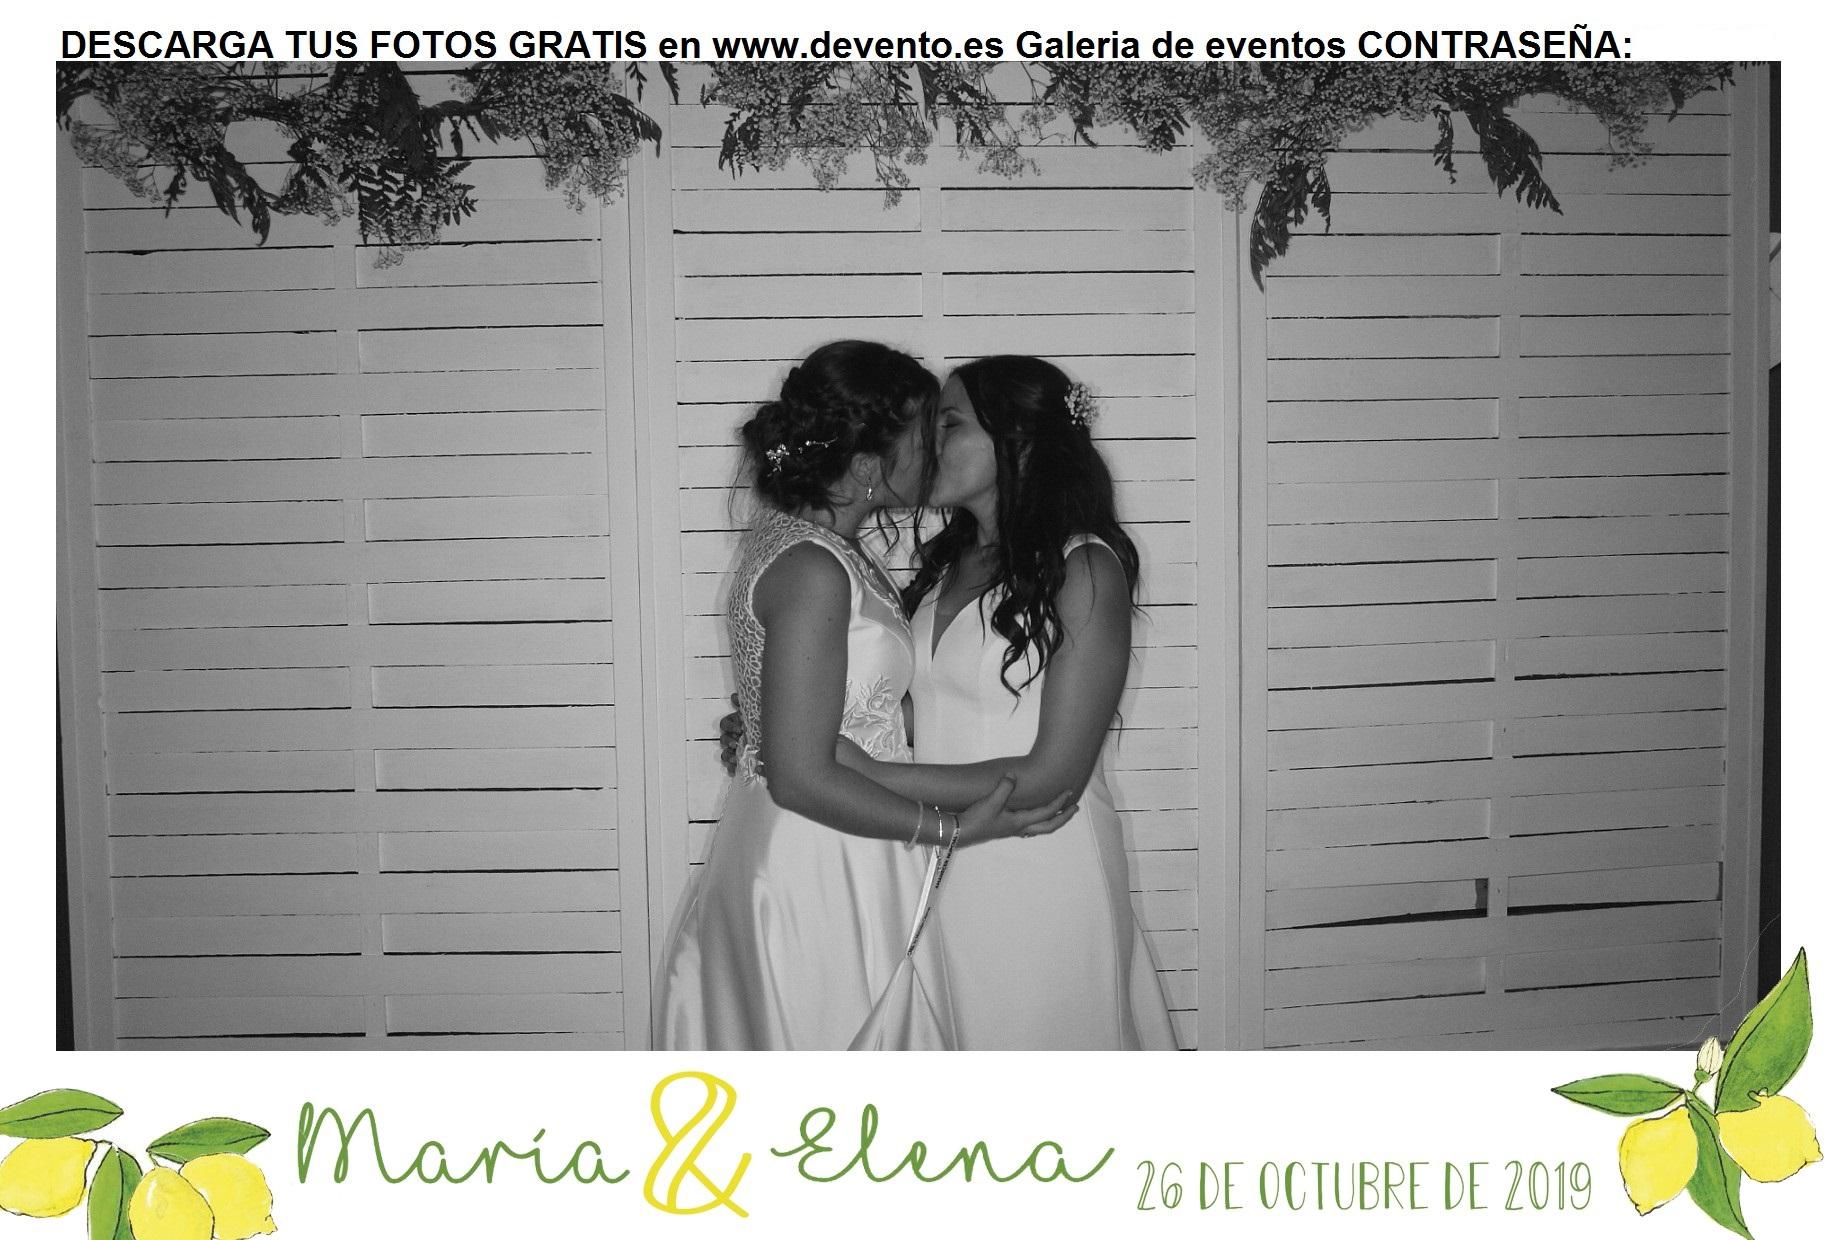 MARIA & ELENA